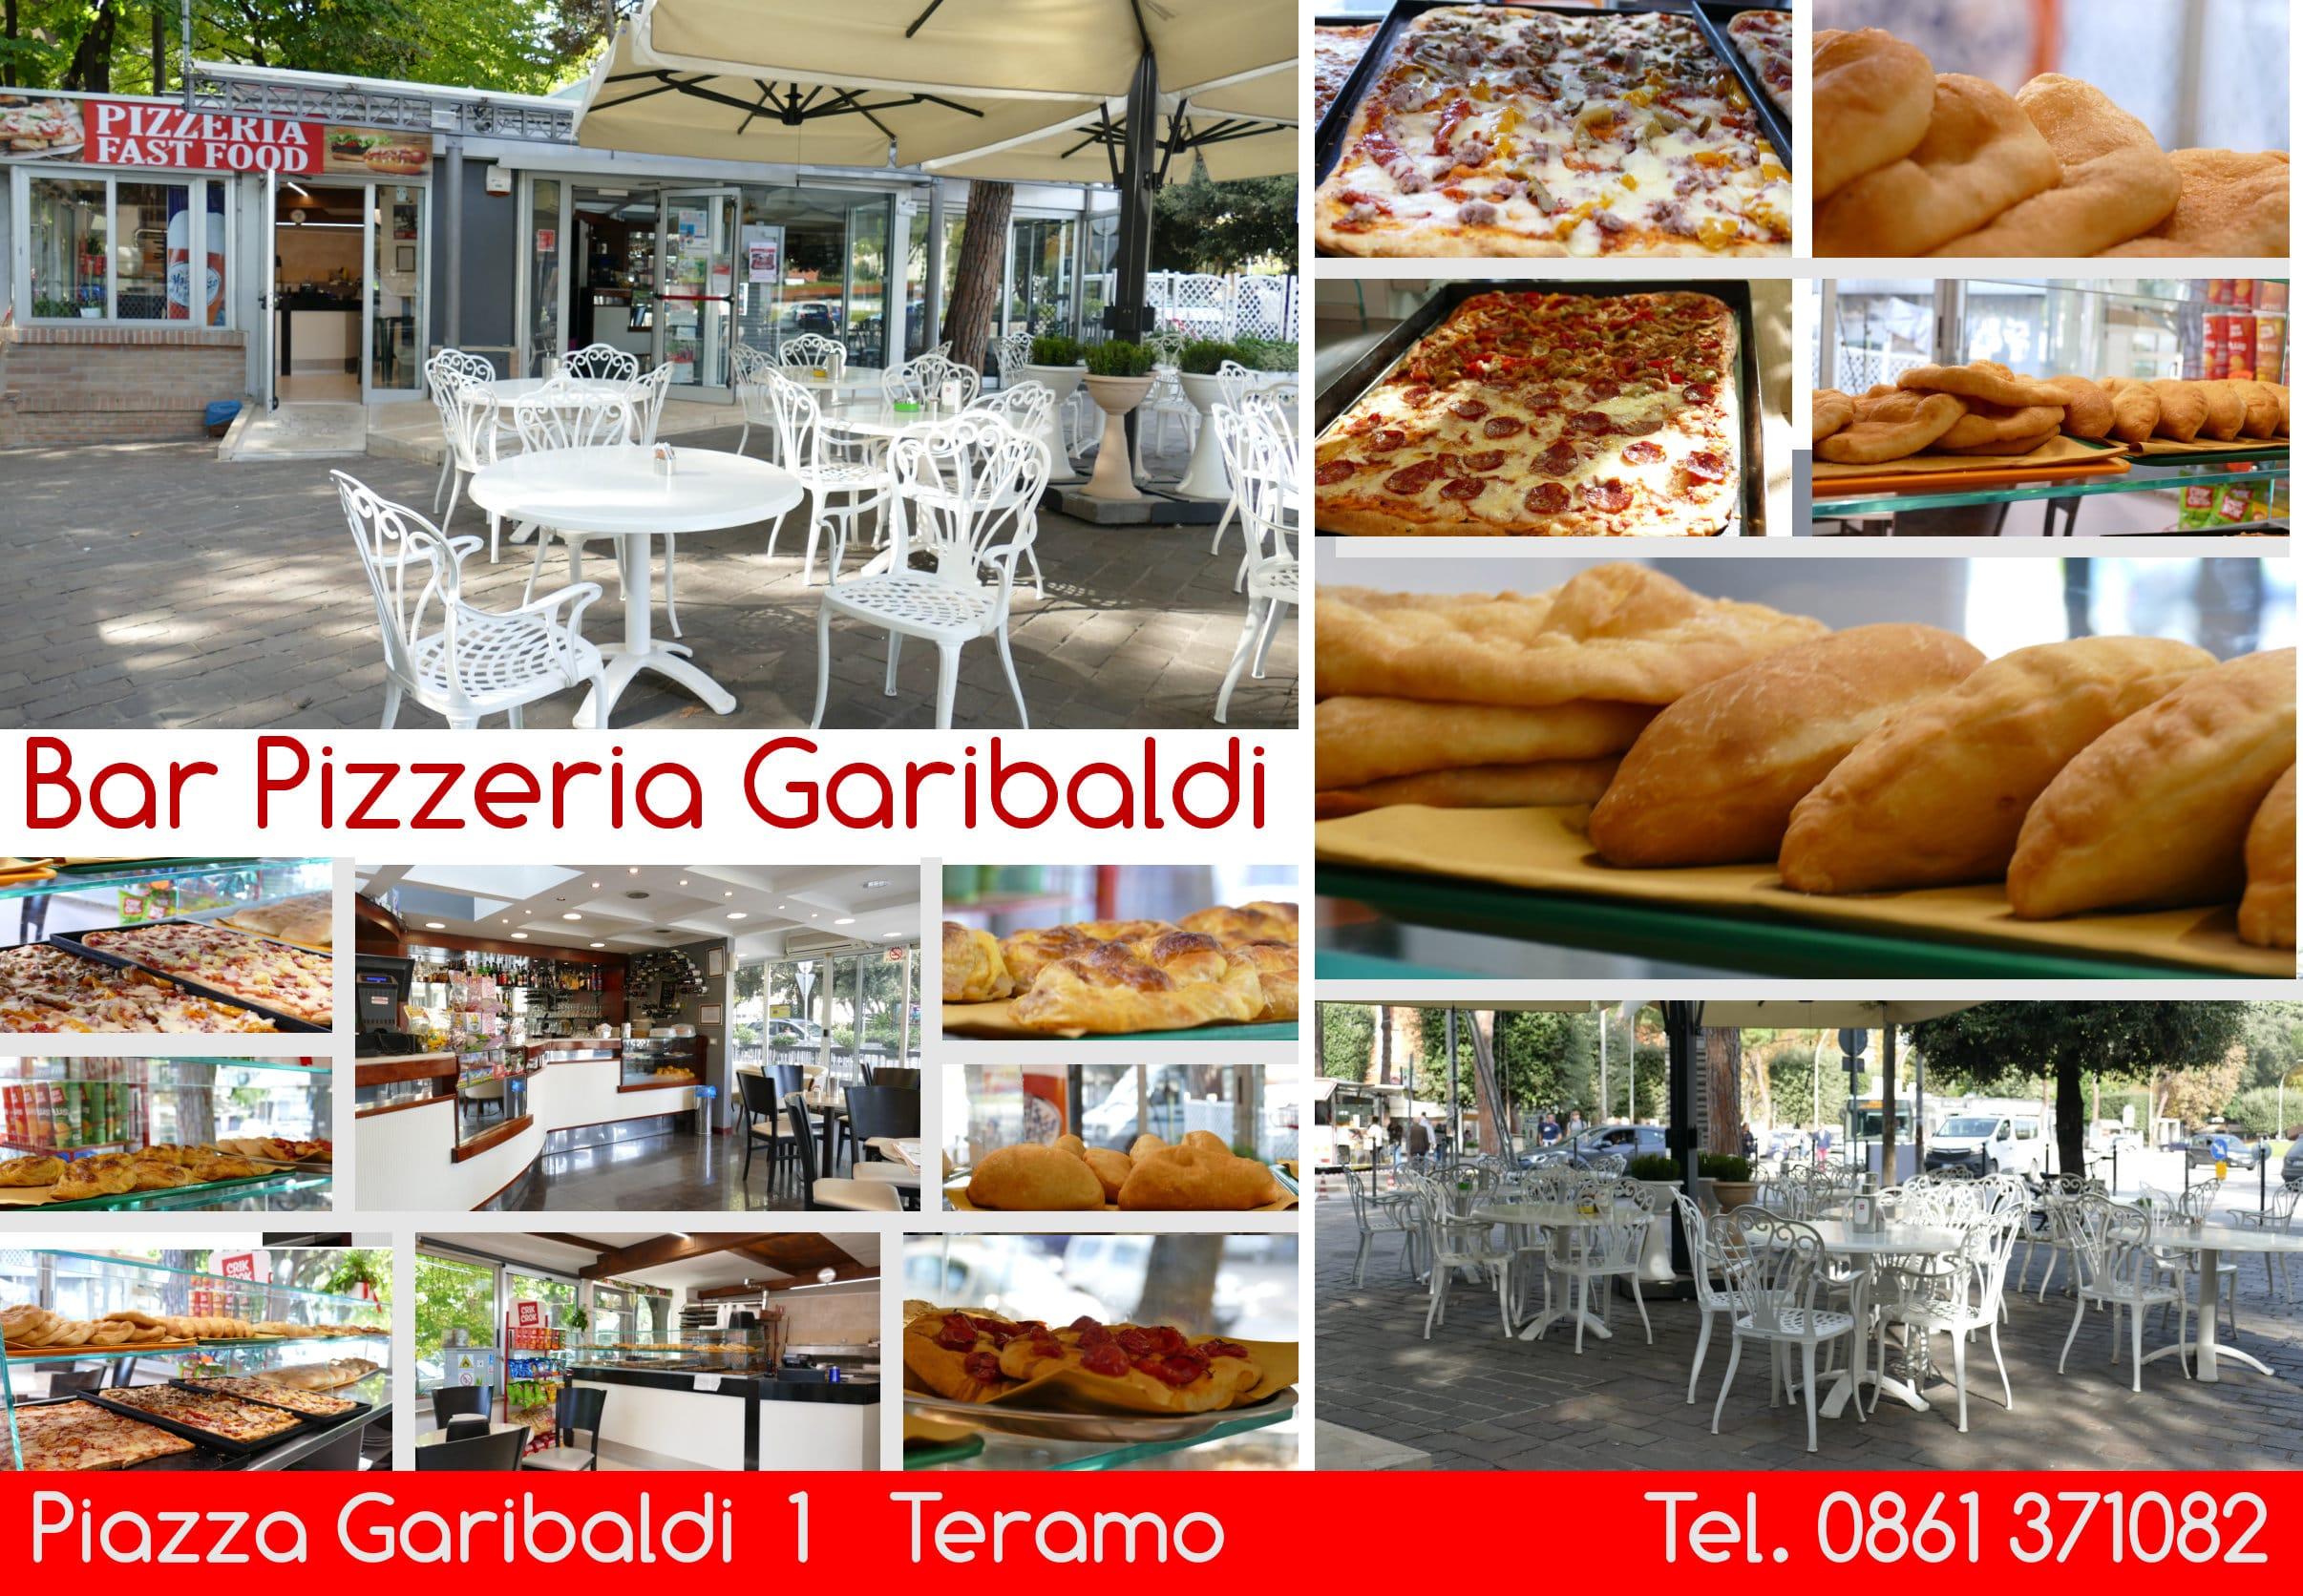 Bigliettino Bar Pizzeria Garibaldi